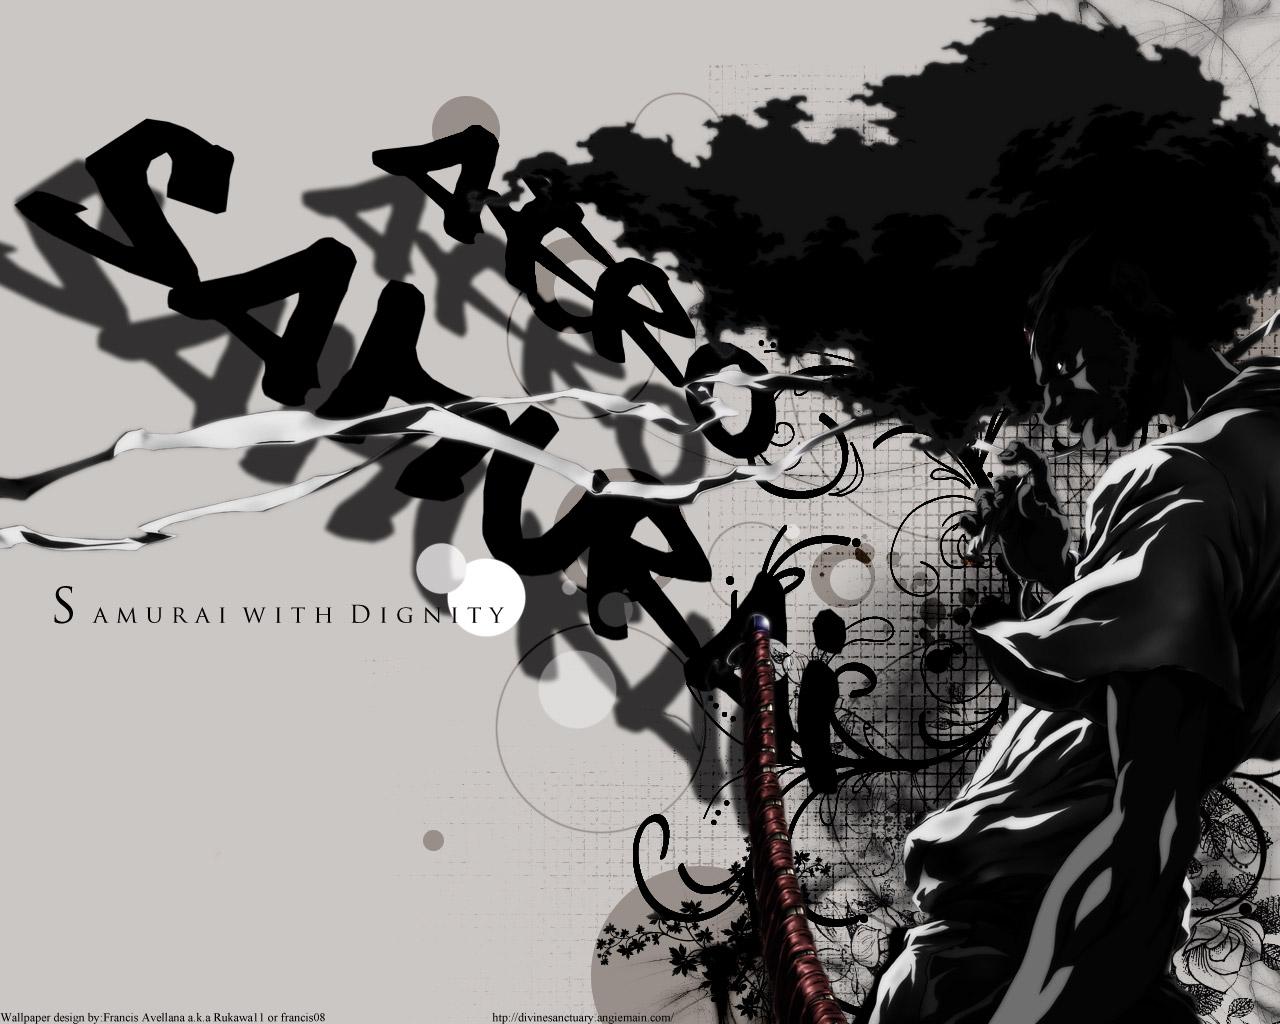 http://2.bp.blogspot.com/_NrsQjnUax9g/TTSFbf1KVNI/AAAAAAAACBY/qAI70o97kAw/s1600/Afro-Samurai-Wallpaper-+_2_.jpg